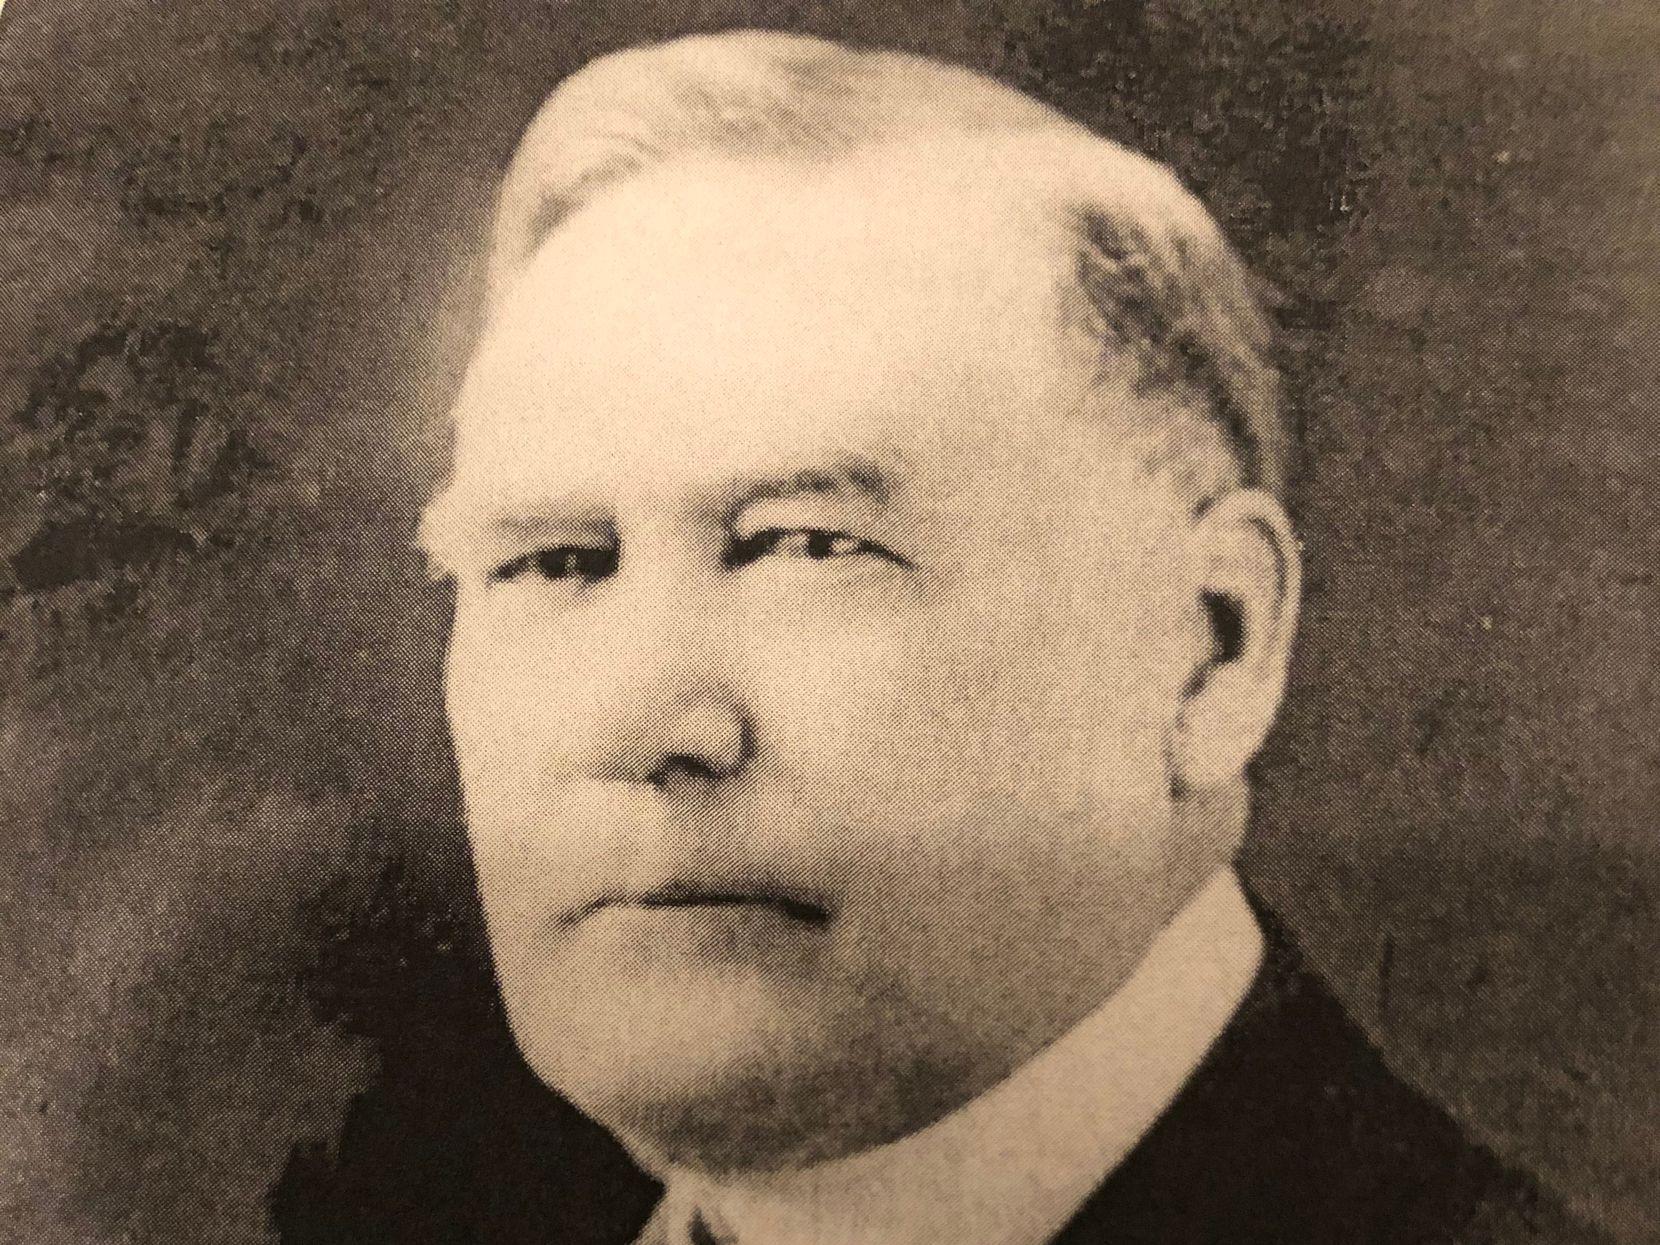 F.M. Bralley ran the women's college in Denton.